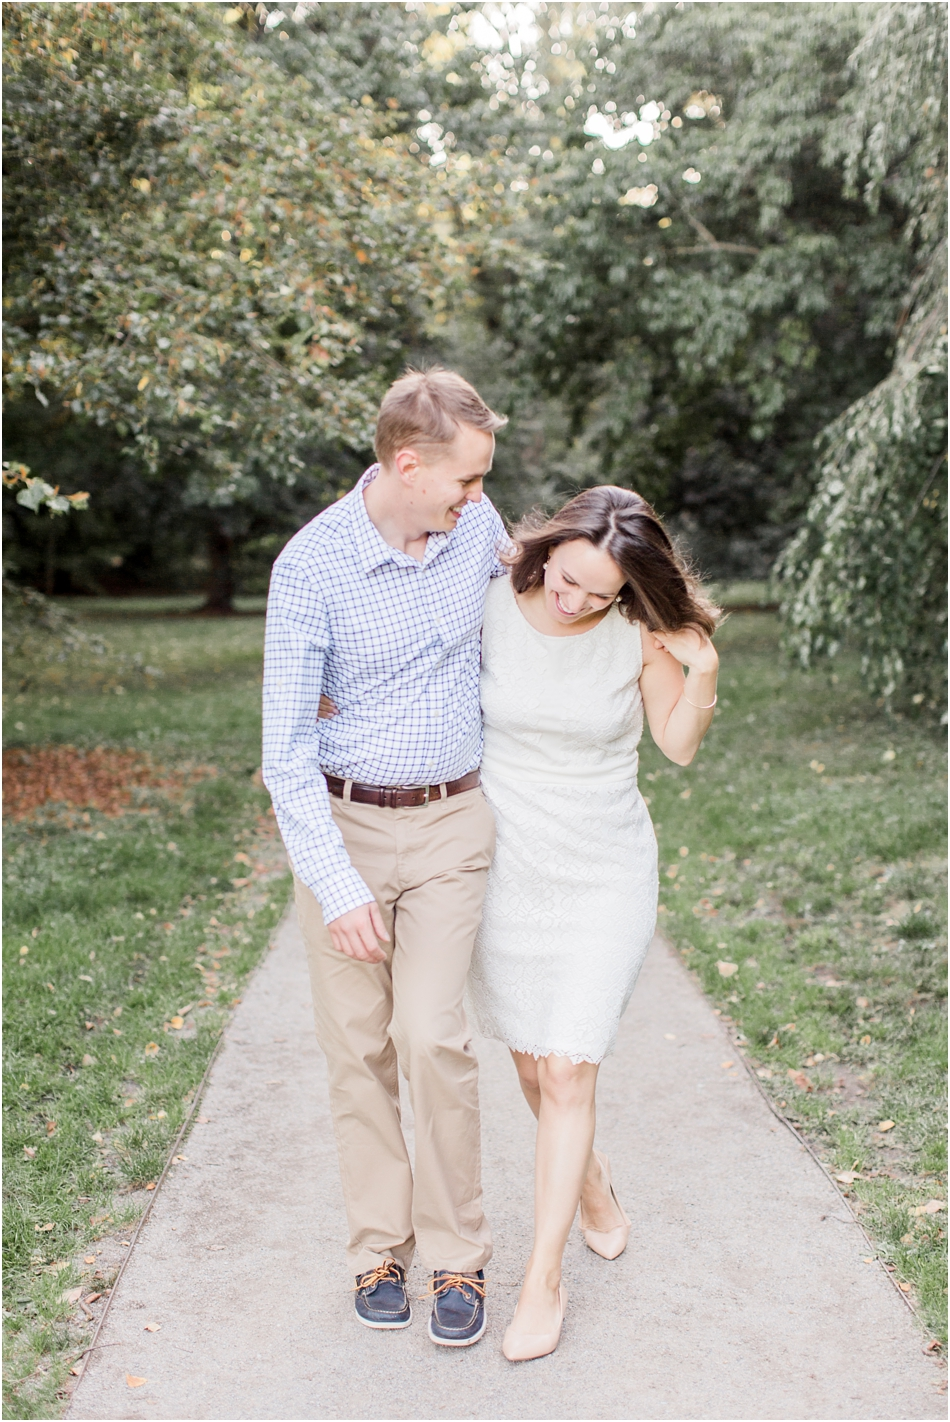 arnold_arboretum_engagement_dylan_mariana_cape_cod_boston_new_england_wedding_photographer_Meredith_Jane_Photography_photo_2655.jpg